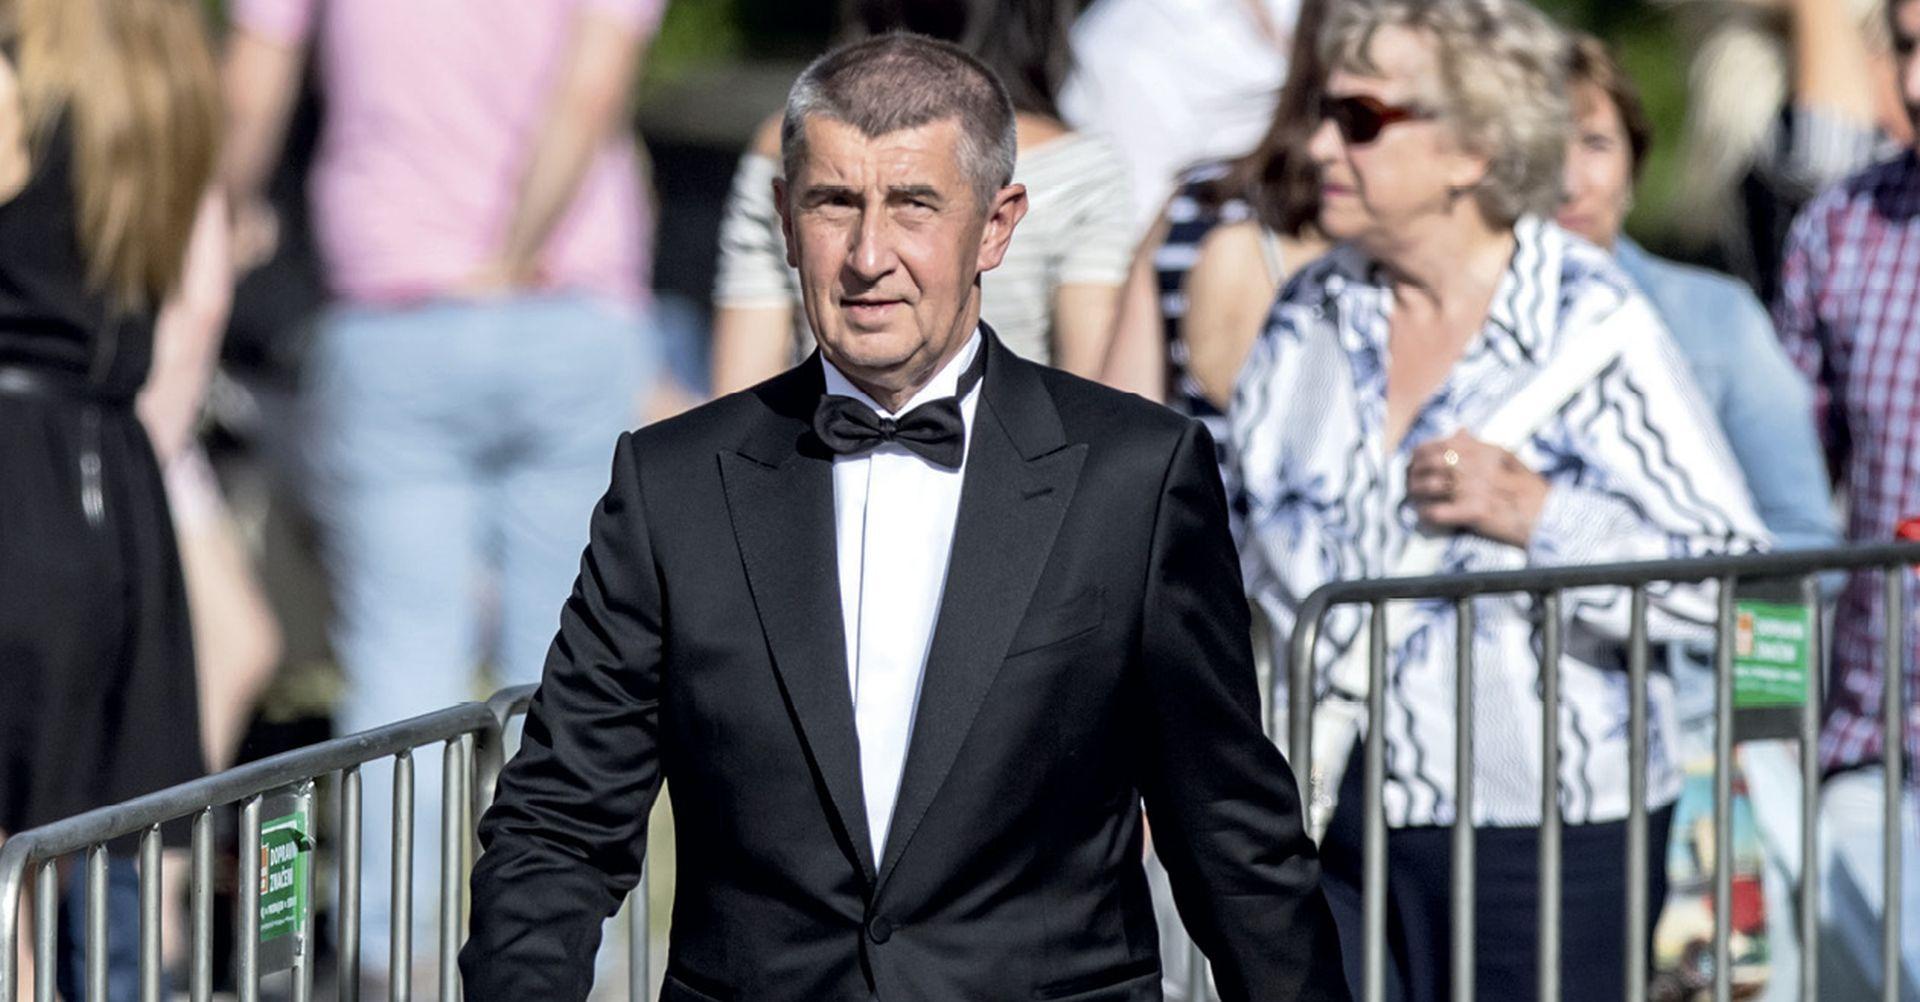 Češki ministar financija 'preživio' skandal zbog bliskih veza s predsjednikom